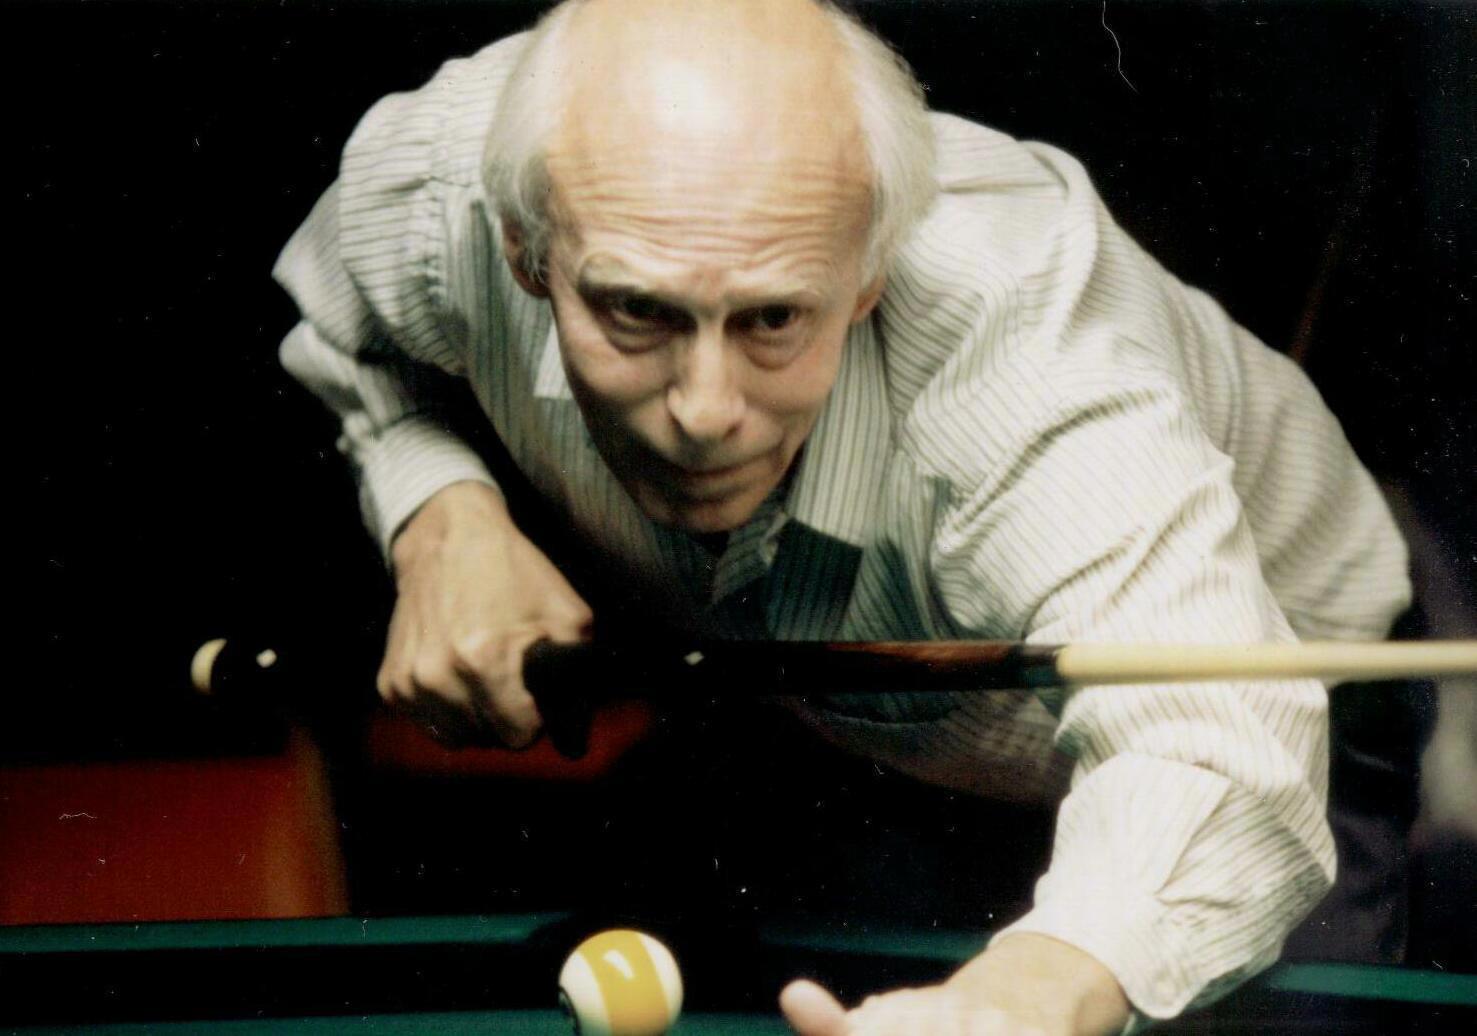 Grady Mathews: good friend & although Rod won every game on bar/3-cushion  table, Grady won more $ on big table: 1-pocket in CO 1980